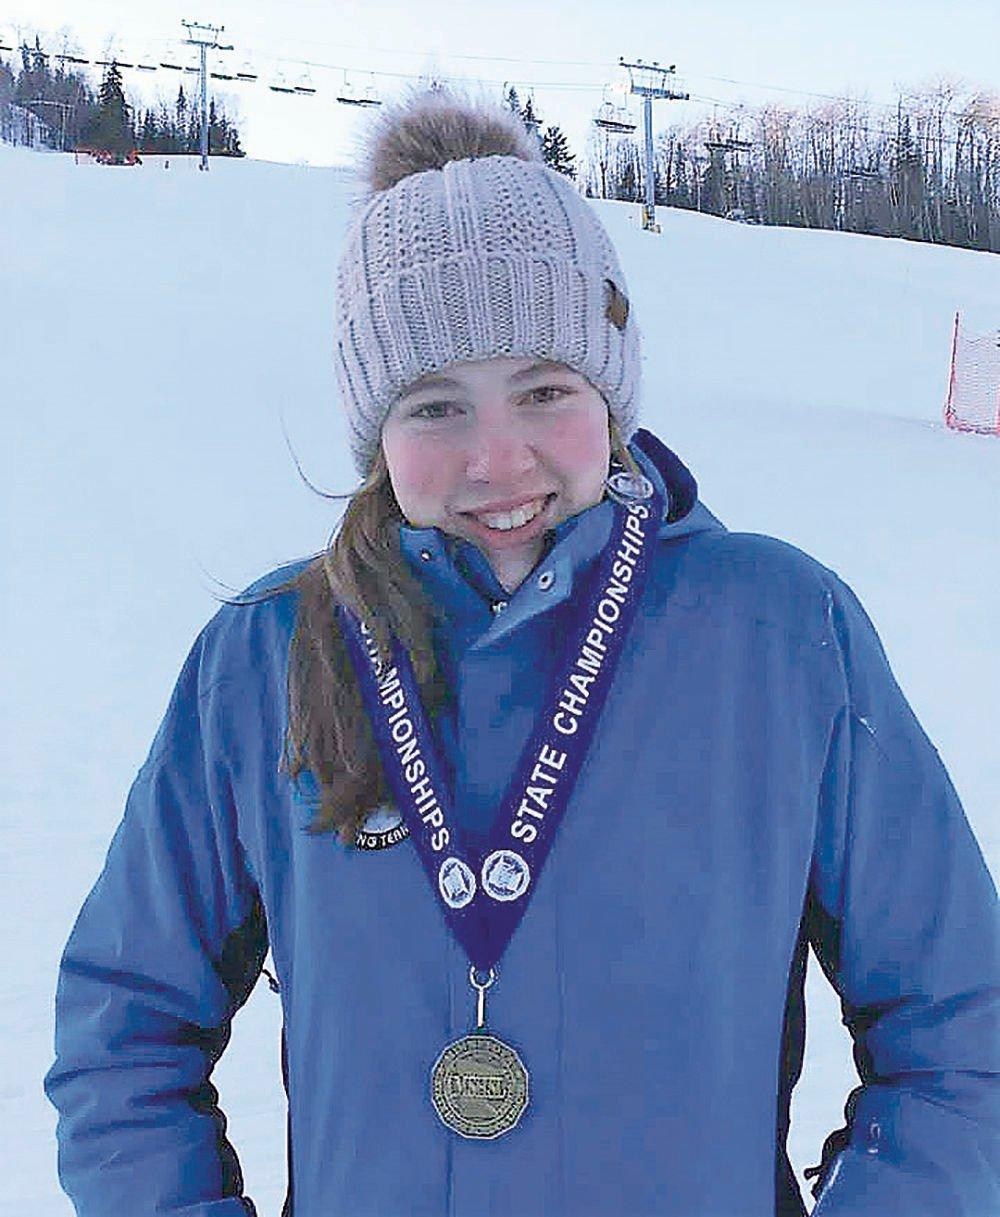 Eagan's Sophia Palmquist wins Alpine gold